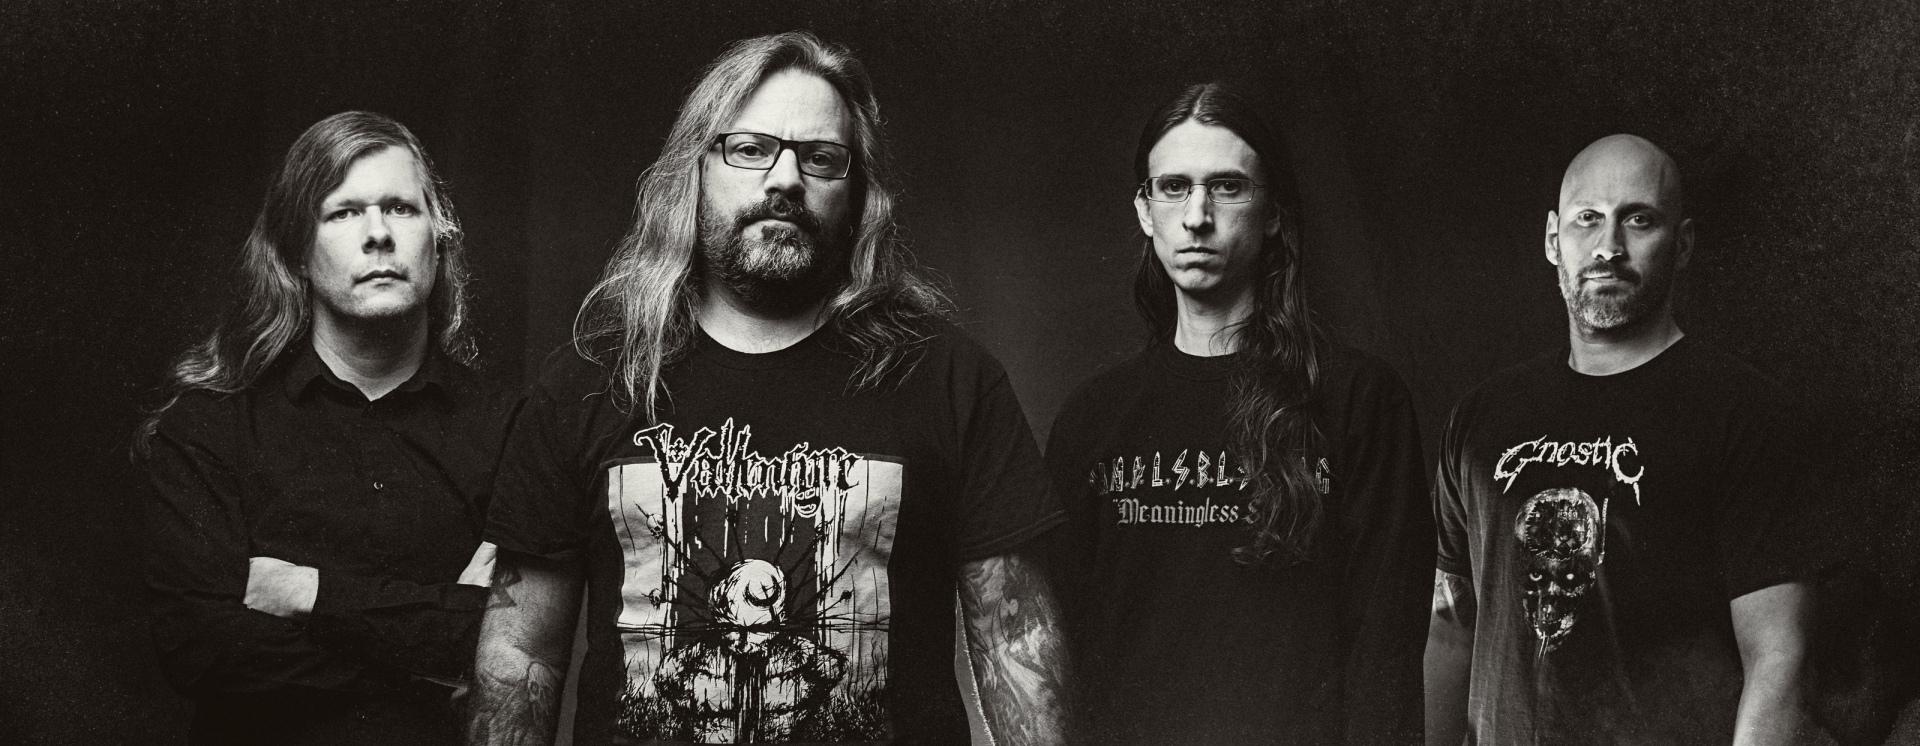 Black t shirt reverbnation - Black T Shirt Reverbnation 47